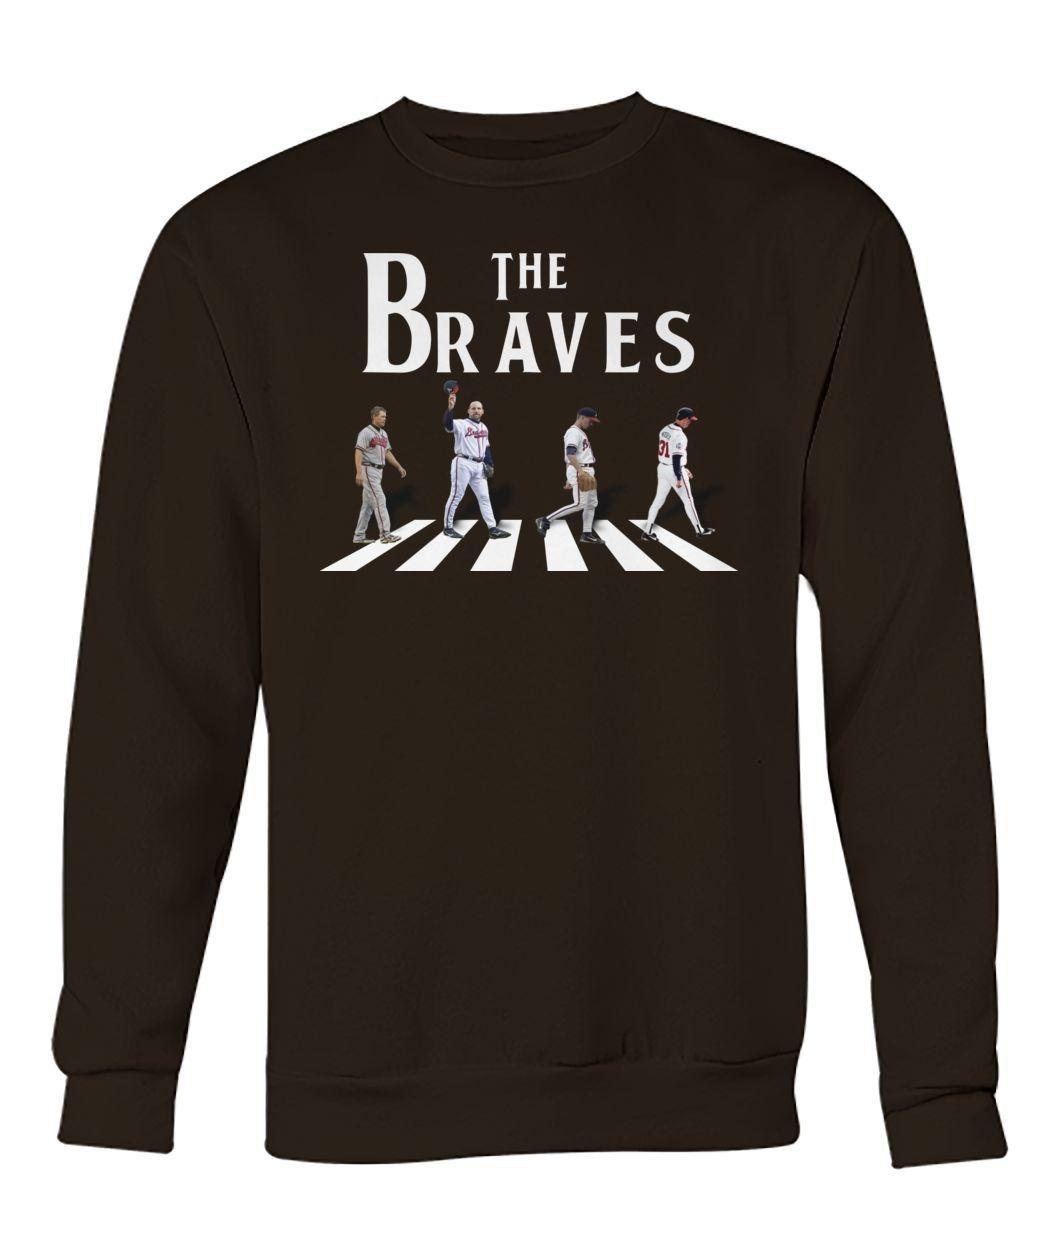 The braves abbey road sweatshirt